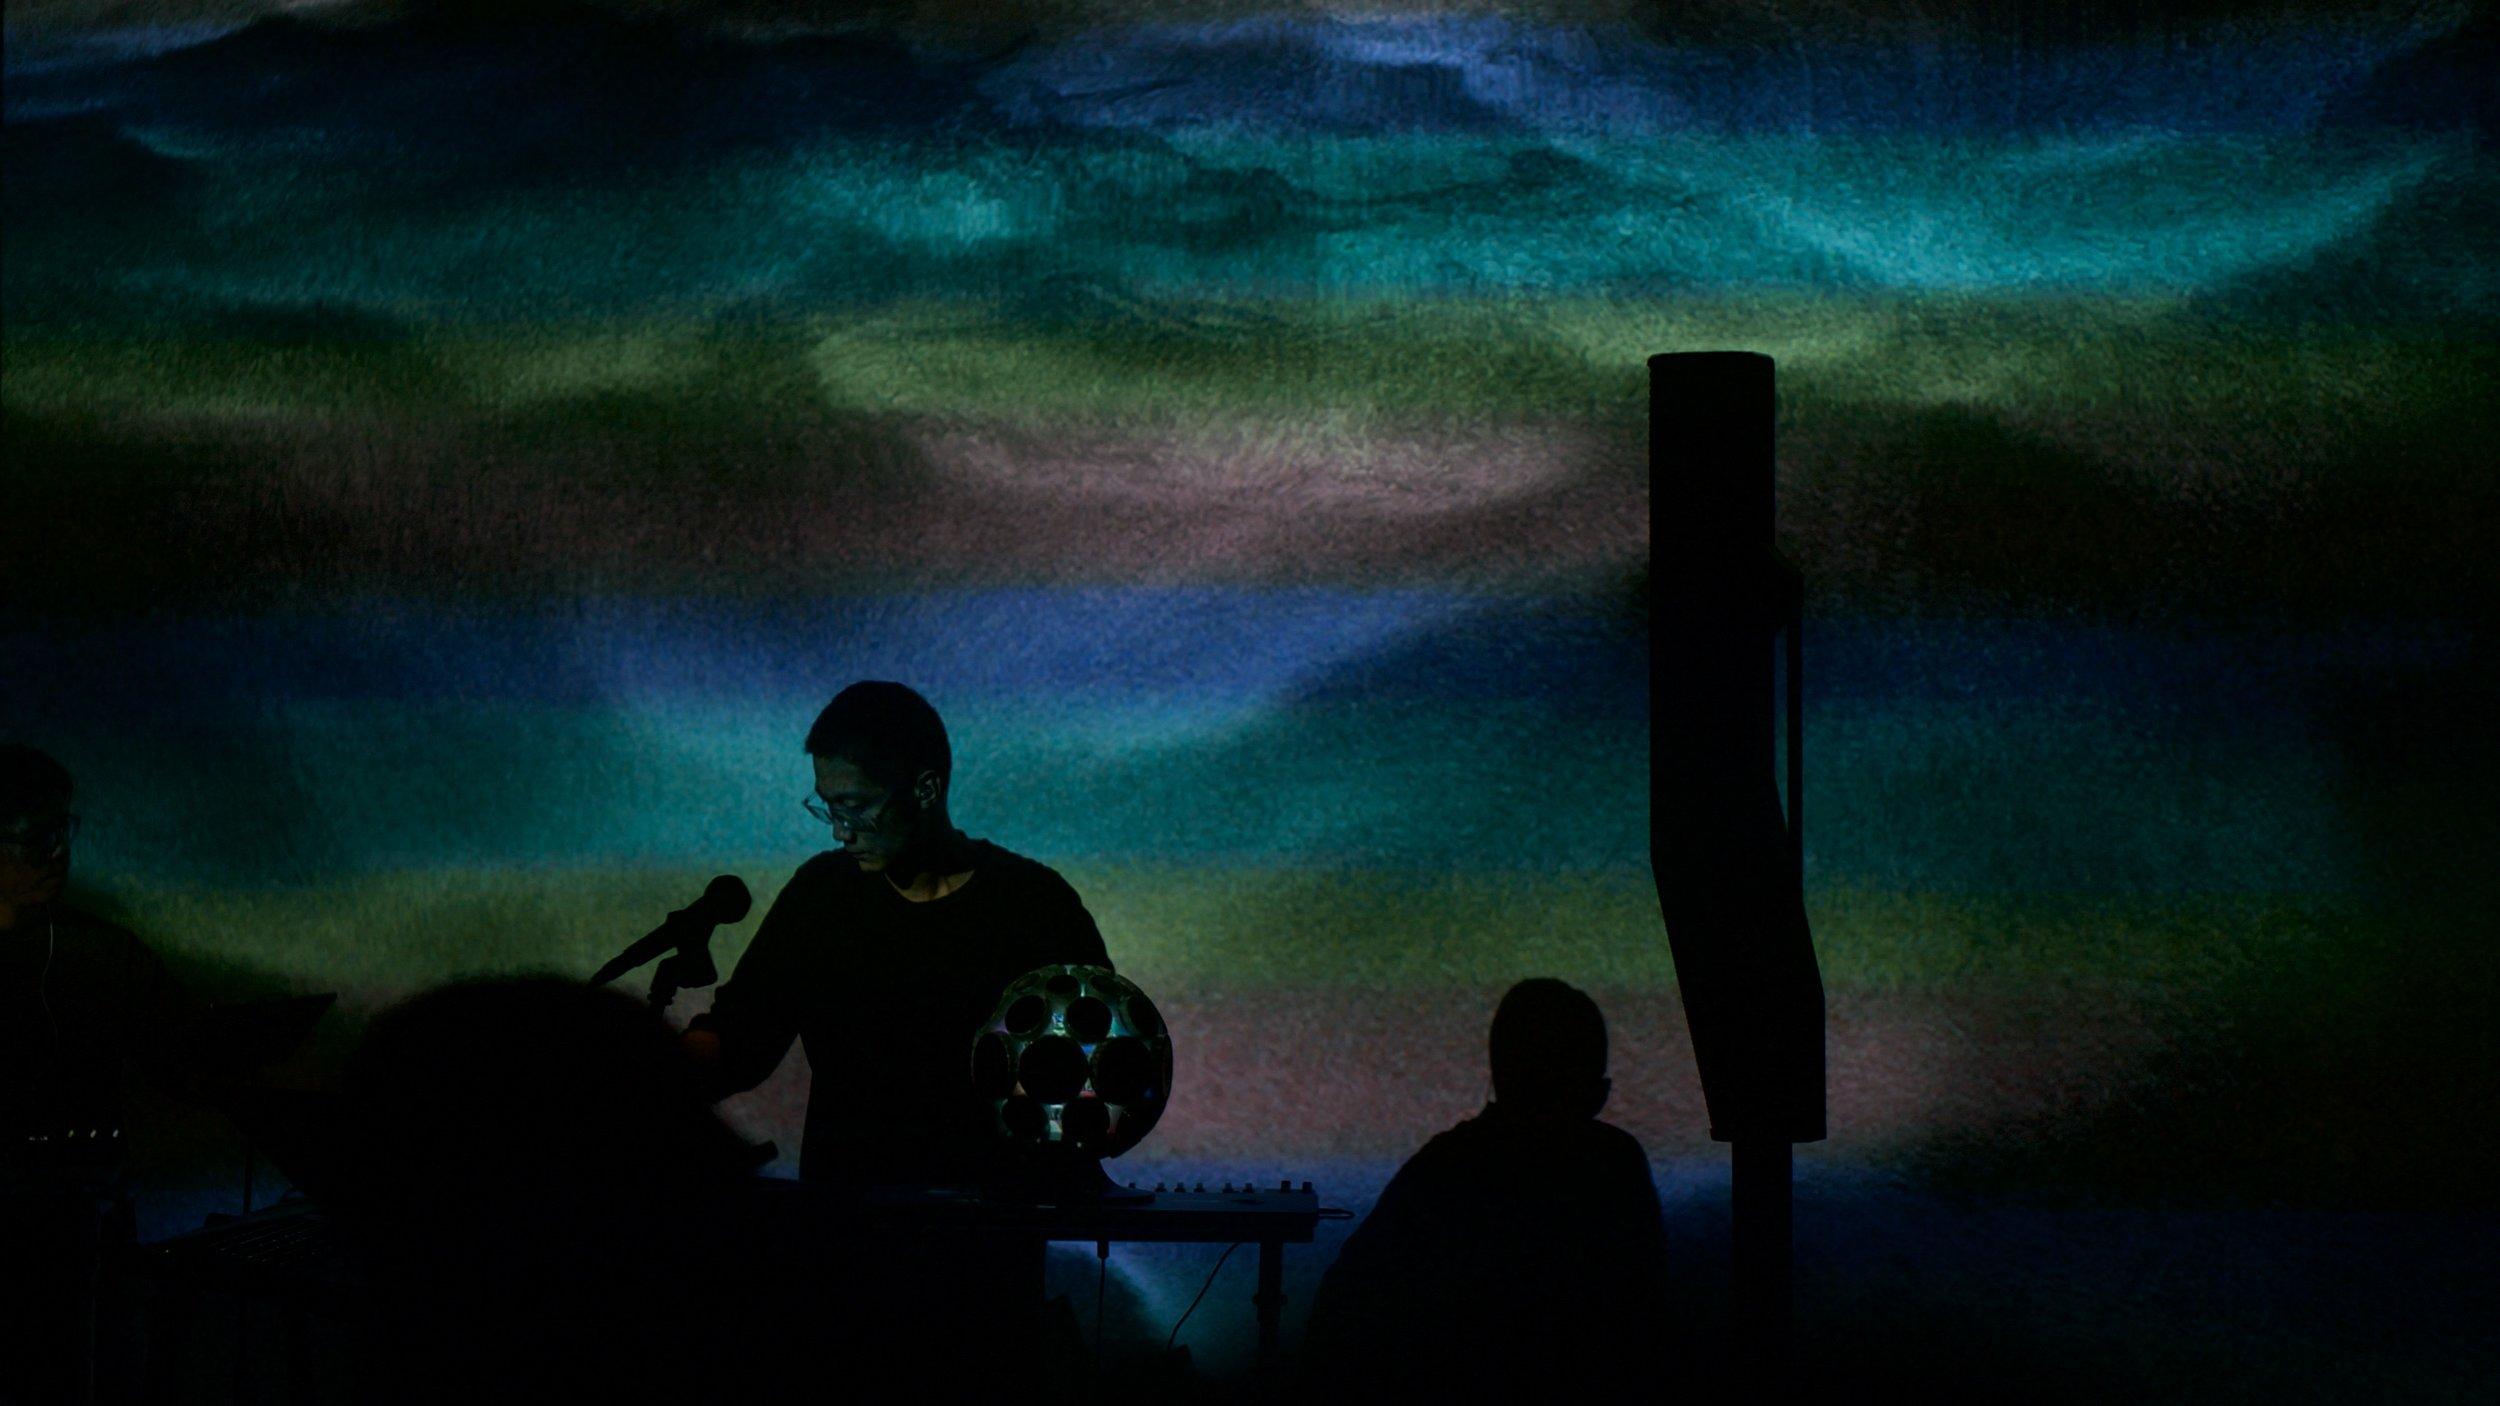 "Jason Hou是一名来自北京的音乐制作人与声音设计师,他的作品在多样化的声音元素与风格交融的同时保持着稳固的连续性与鲜明的个人风格。作为知名的 AlphaSphere  (创意MIDI控制器) 演奏者,Jason于2016年受邀在德国慕尼黑的BMW总部表演,2018年初参加德国CTM音乐节,在柏林著名俱乐部Berghain中表演。 Jason是 第二感音频科技  (2nd Sense Audio) 的创始成员之一,作为产品与声音设计师参与了合成器软件 WIGGLE 的研发,软件推出后获得了Computer Music (电脑音乐)杂志颁发的年度创新与表现奖。  Jason在北京电子音乐厂牌Do Hits发表全长专辑 《生》 、EP 《原》 ; 在新乐府发表与京剧艺术家谭正岩合作的 ""定军山"" 与 ""空城计"" 选段remix; 在Muti Music发表为ill.Gates制作的  ""More Tea""  remix;参与德国音乐科技公司Native Instruments的第二期 "" Native Sketches音乐随笔 "" 项目;为Intel公司酷睿处理器广告制作音乐并代言;为唱作人阿朵的专辑《死里复活》中 ""起初"" 与 ""那里是哪里"" 两首歌编曲;为导演萧潇的纪录片 ""团鱼岩"" 配乐。他的作品获得了鼓大师Jojo Mayer, 厂牌Mad Decent及Boiler Room的推荐。作为DJ,Jason的guest mix曾在Rinse FM及Radar Radio播出。  Jason自2015年起与 Hibanana工作室 的视觉艺术家苗晶合作声音影像装置作品 「渐」 、 「O」 、 「博物幻生」 等,作品曾在北京今日美术馆、重庆Apple Store、上海MoCa当代艺术博物馆、美国新墨西哥州Currents New Media 2018艺术节参展。两人在2018年7月合作推出了声音影像现场作品 「初·ZPTPJ」 ,目前已于新墨西哥州Currents New Media 2019艺术节、旧金山Grey Area剧场、第九届全球华语科幻星云奖开幕式、上海长江剧场、Vas Live、多余美术馆補时空间、成都Nu Space、北京CHAO艺术中心等地表演。"